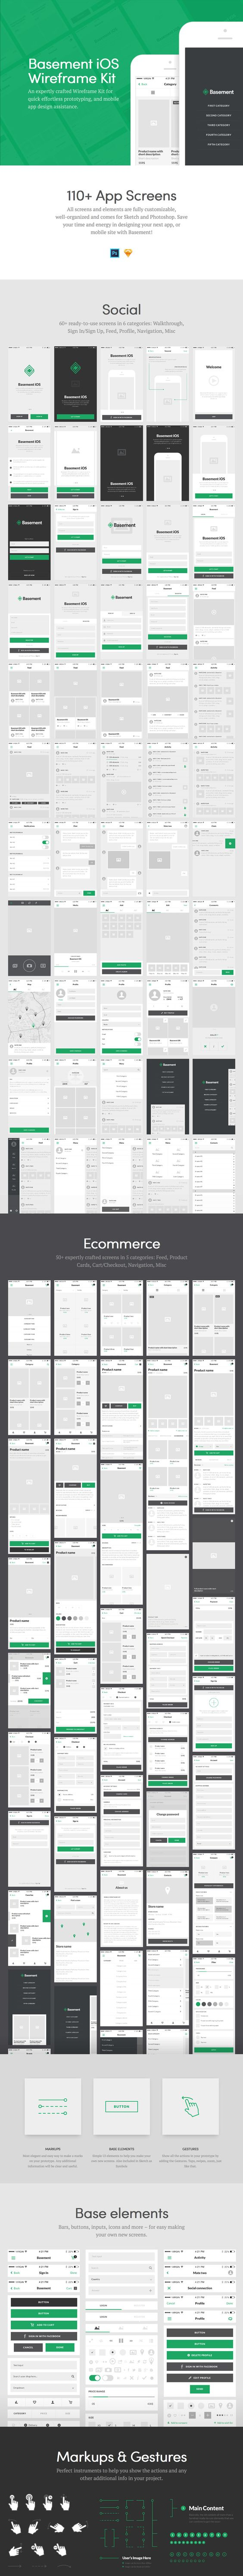 Basement iOS on Market (http://market.designmodo.com/basement-ios/)